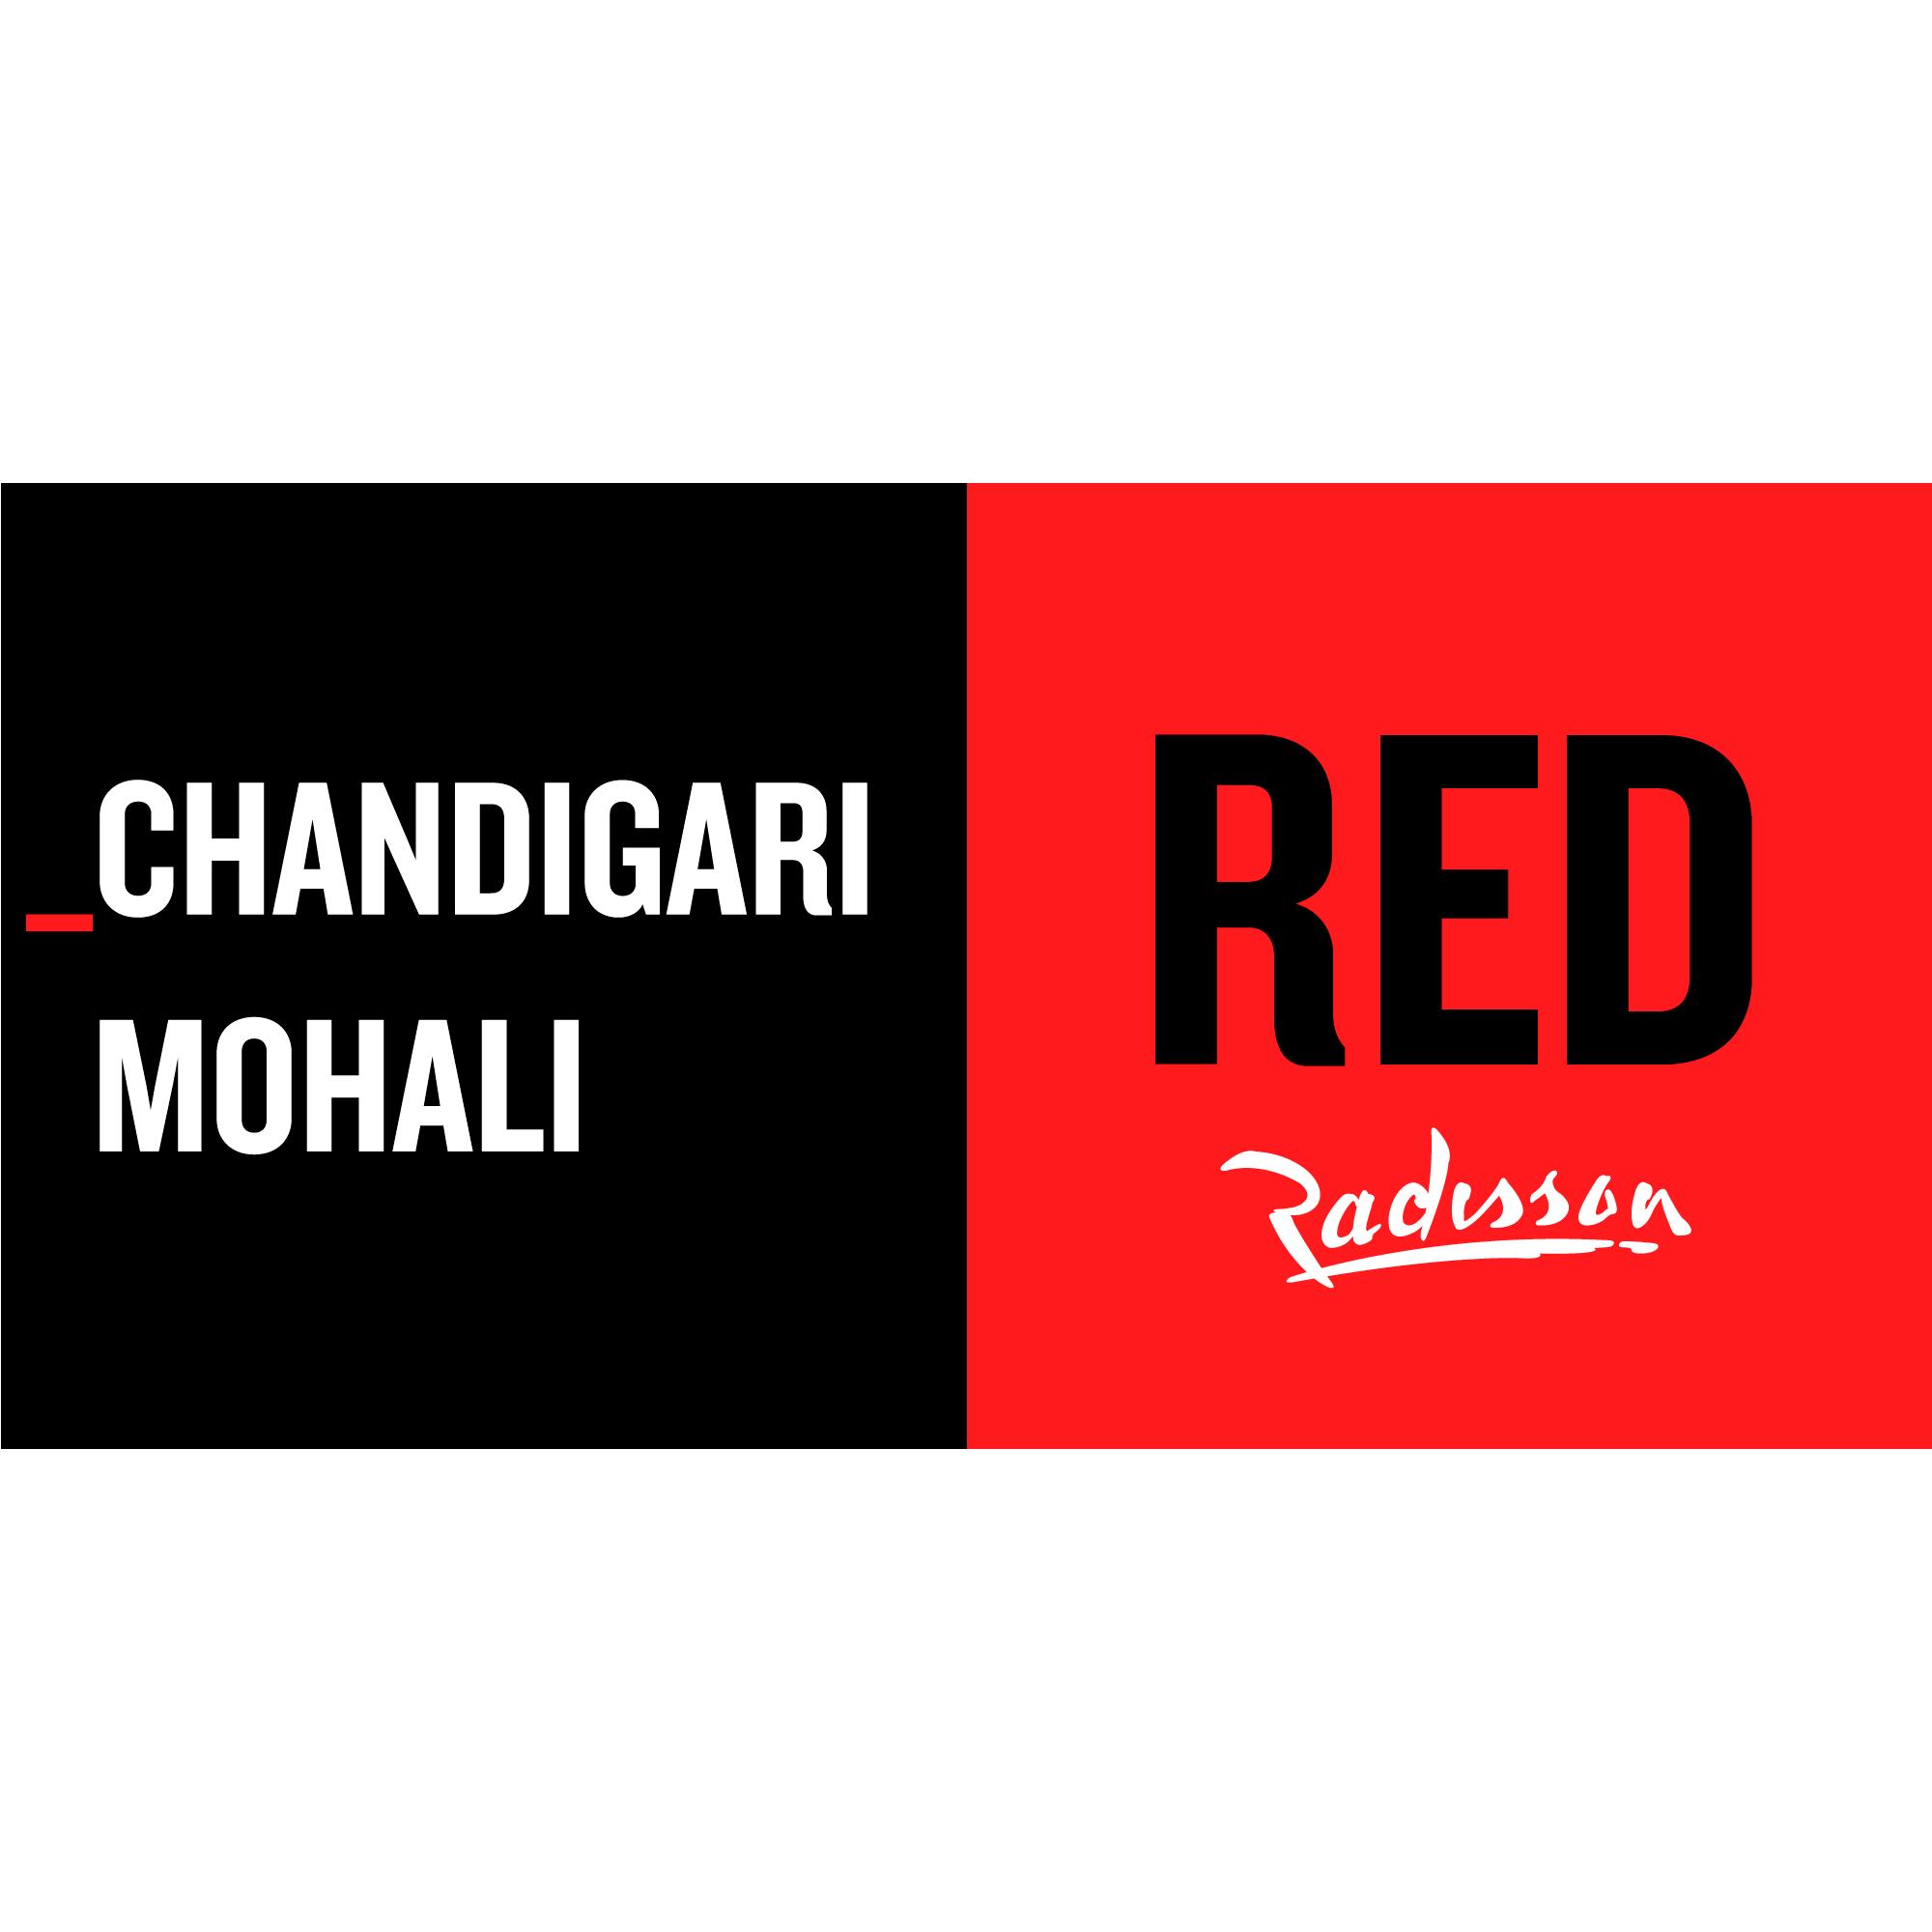 Radisson RED Chandigarh Mohali